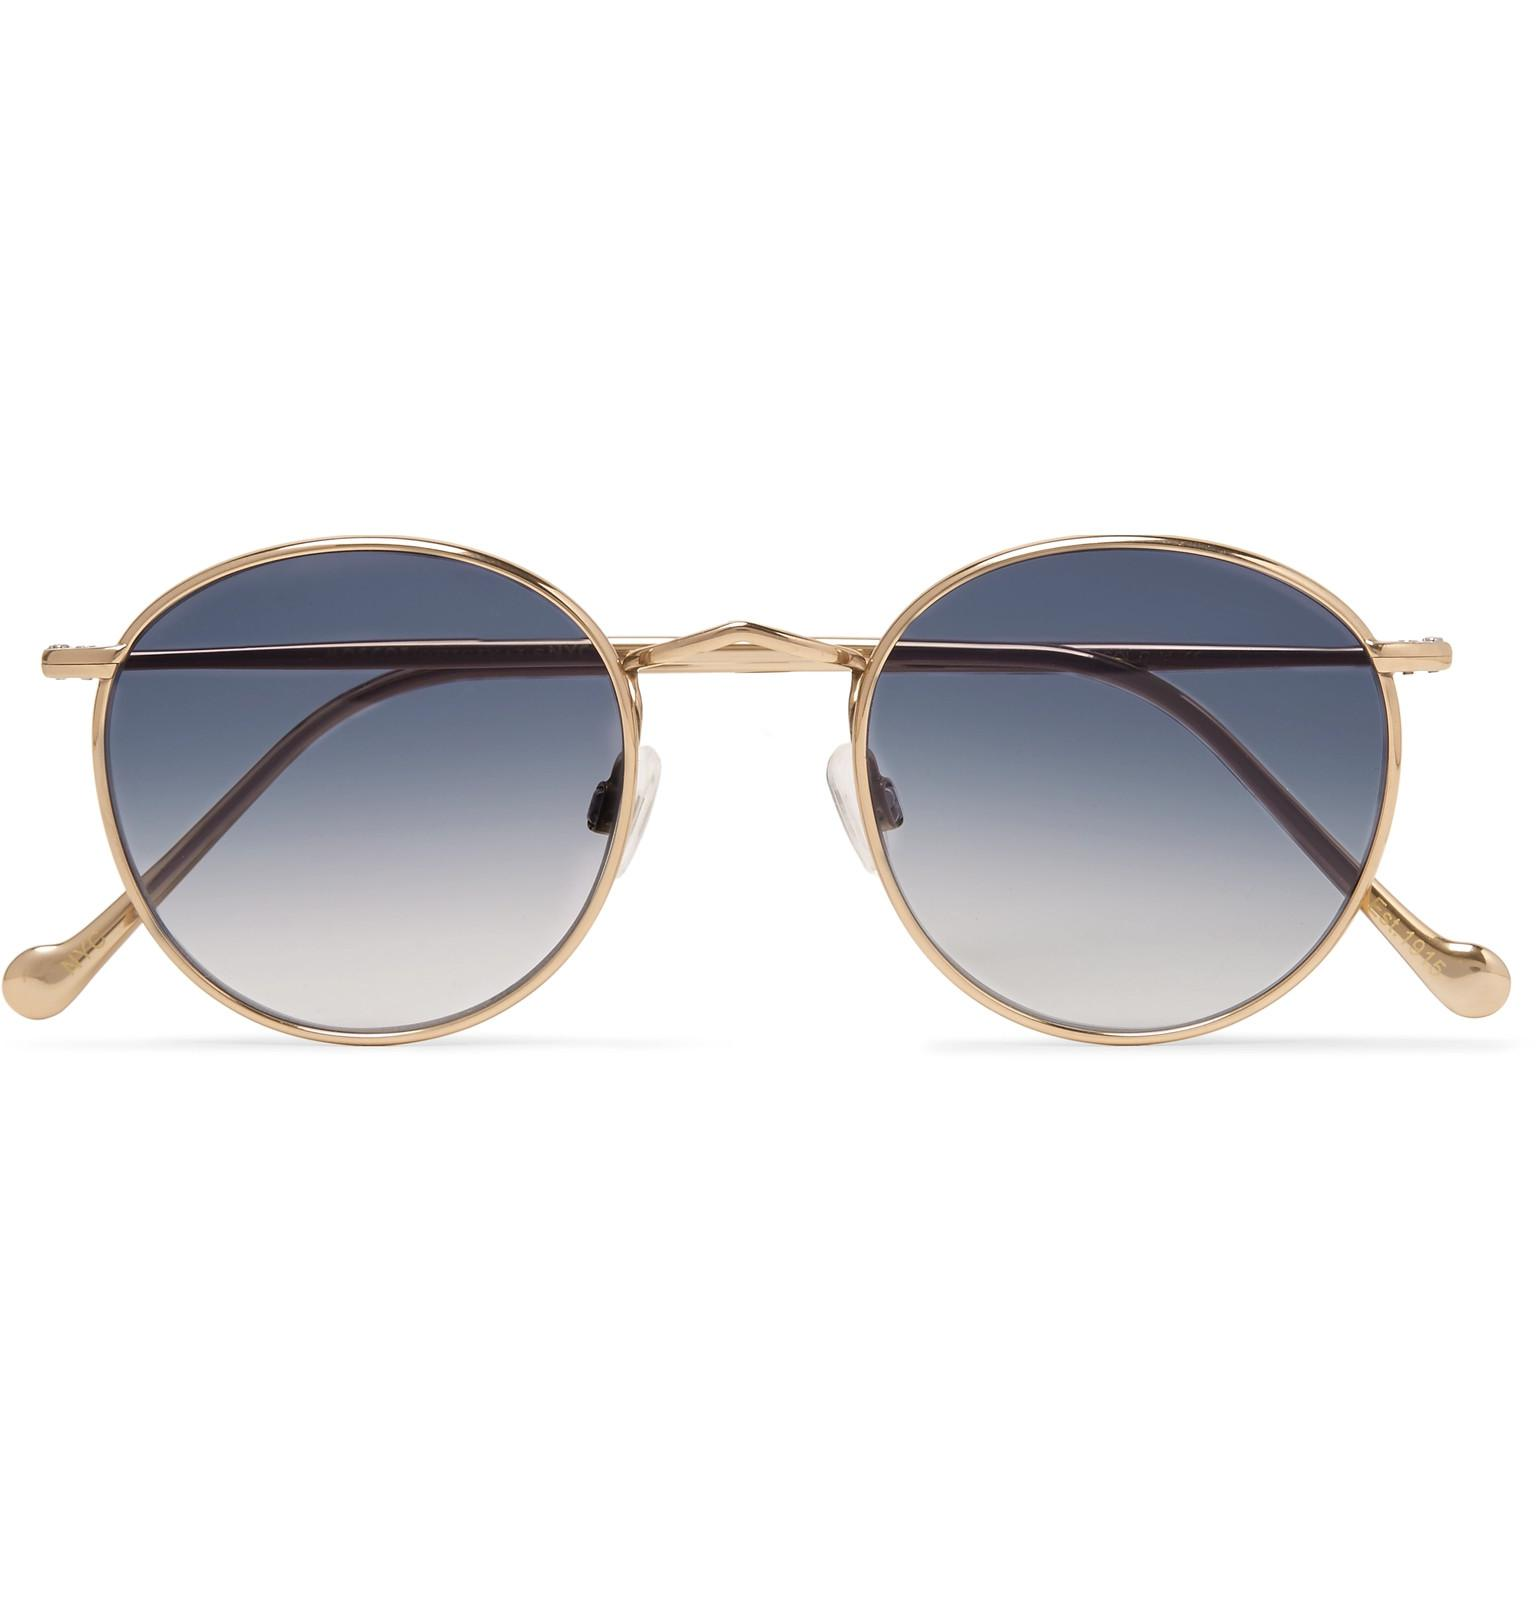 1fad51bfe396 Moscot. Men s Metallic Zev Round-frame Gold-tone Titanium Sunglasses